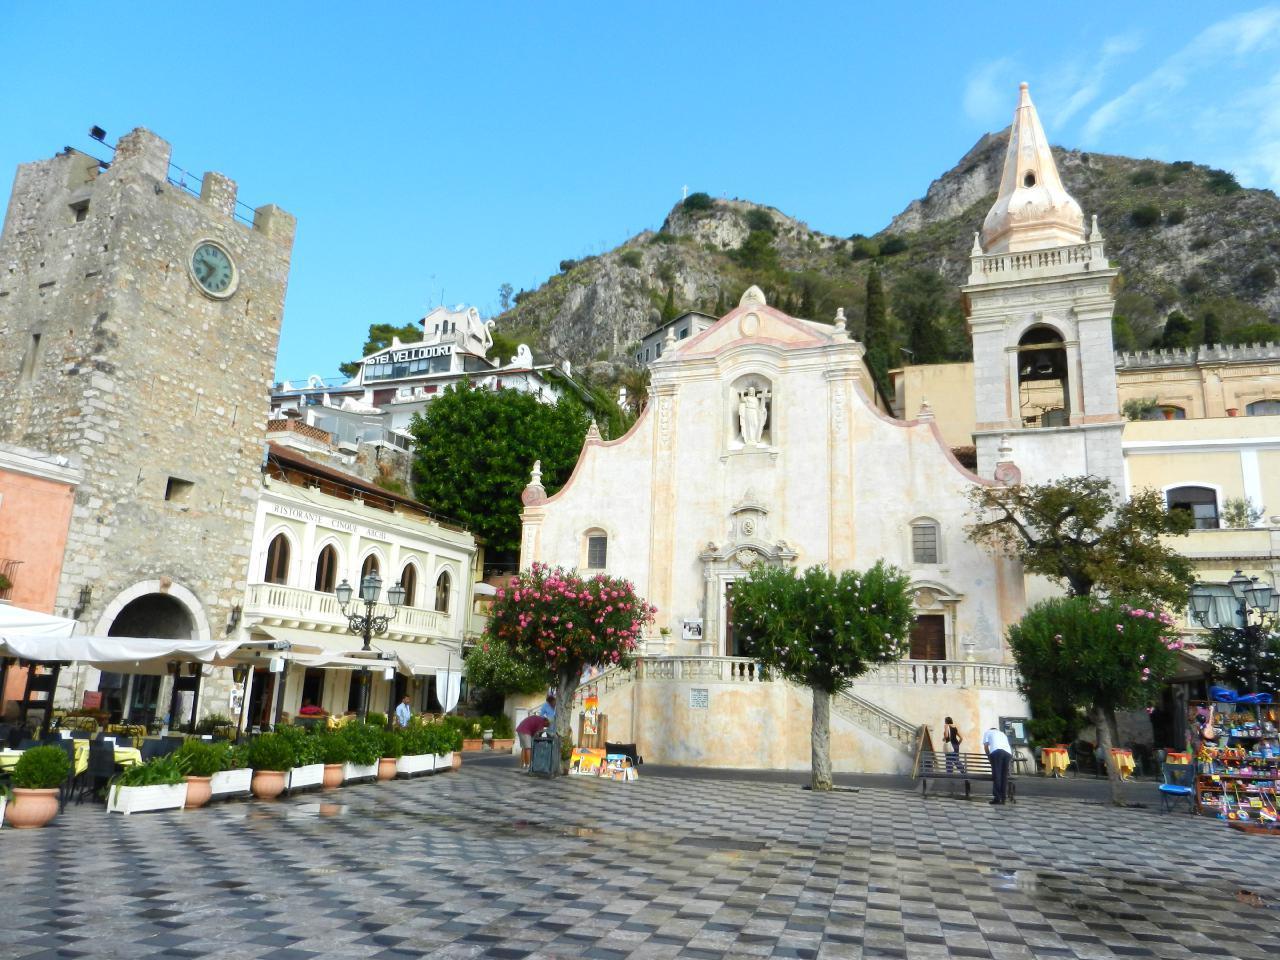 Appartement de vacances Fewo mit Balkon im Panorama-Dorf bei Taormina (737398), Forza d'Agro', Messina, Sicile, Italie, image 15